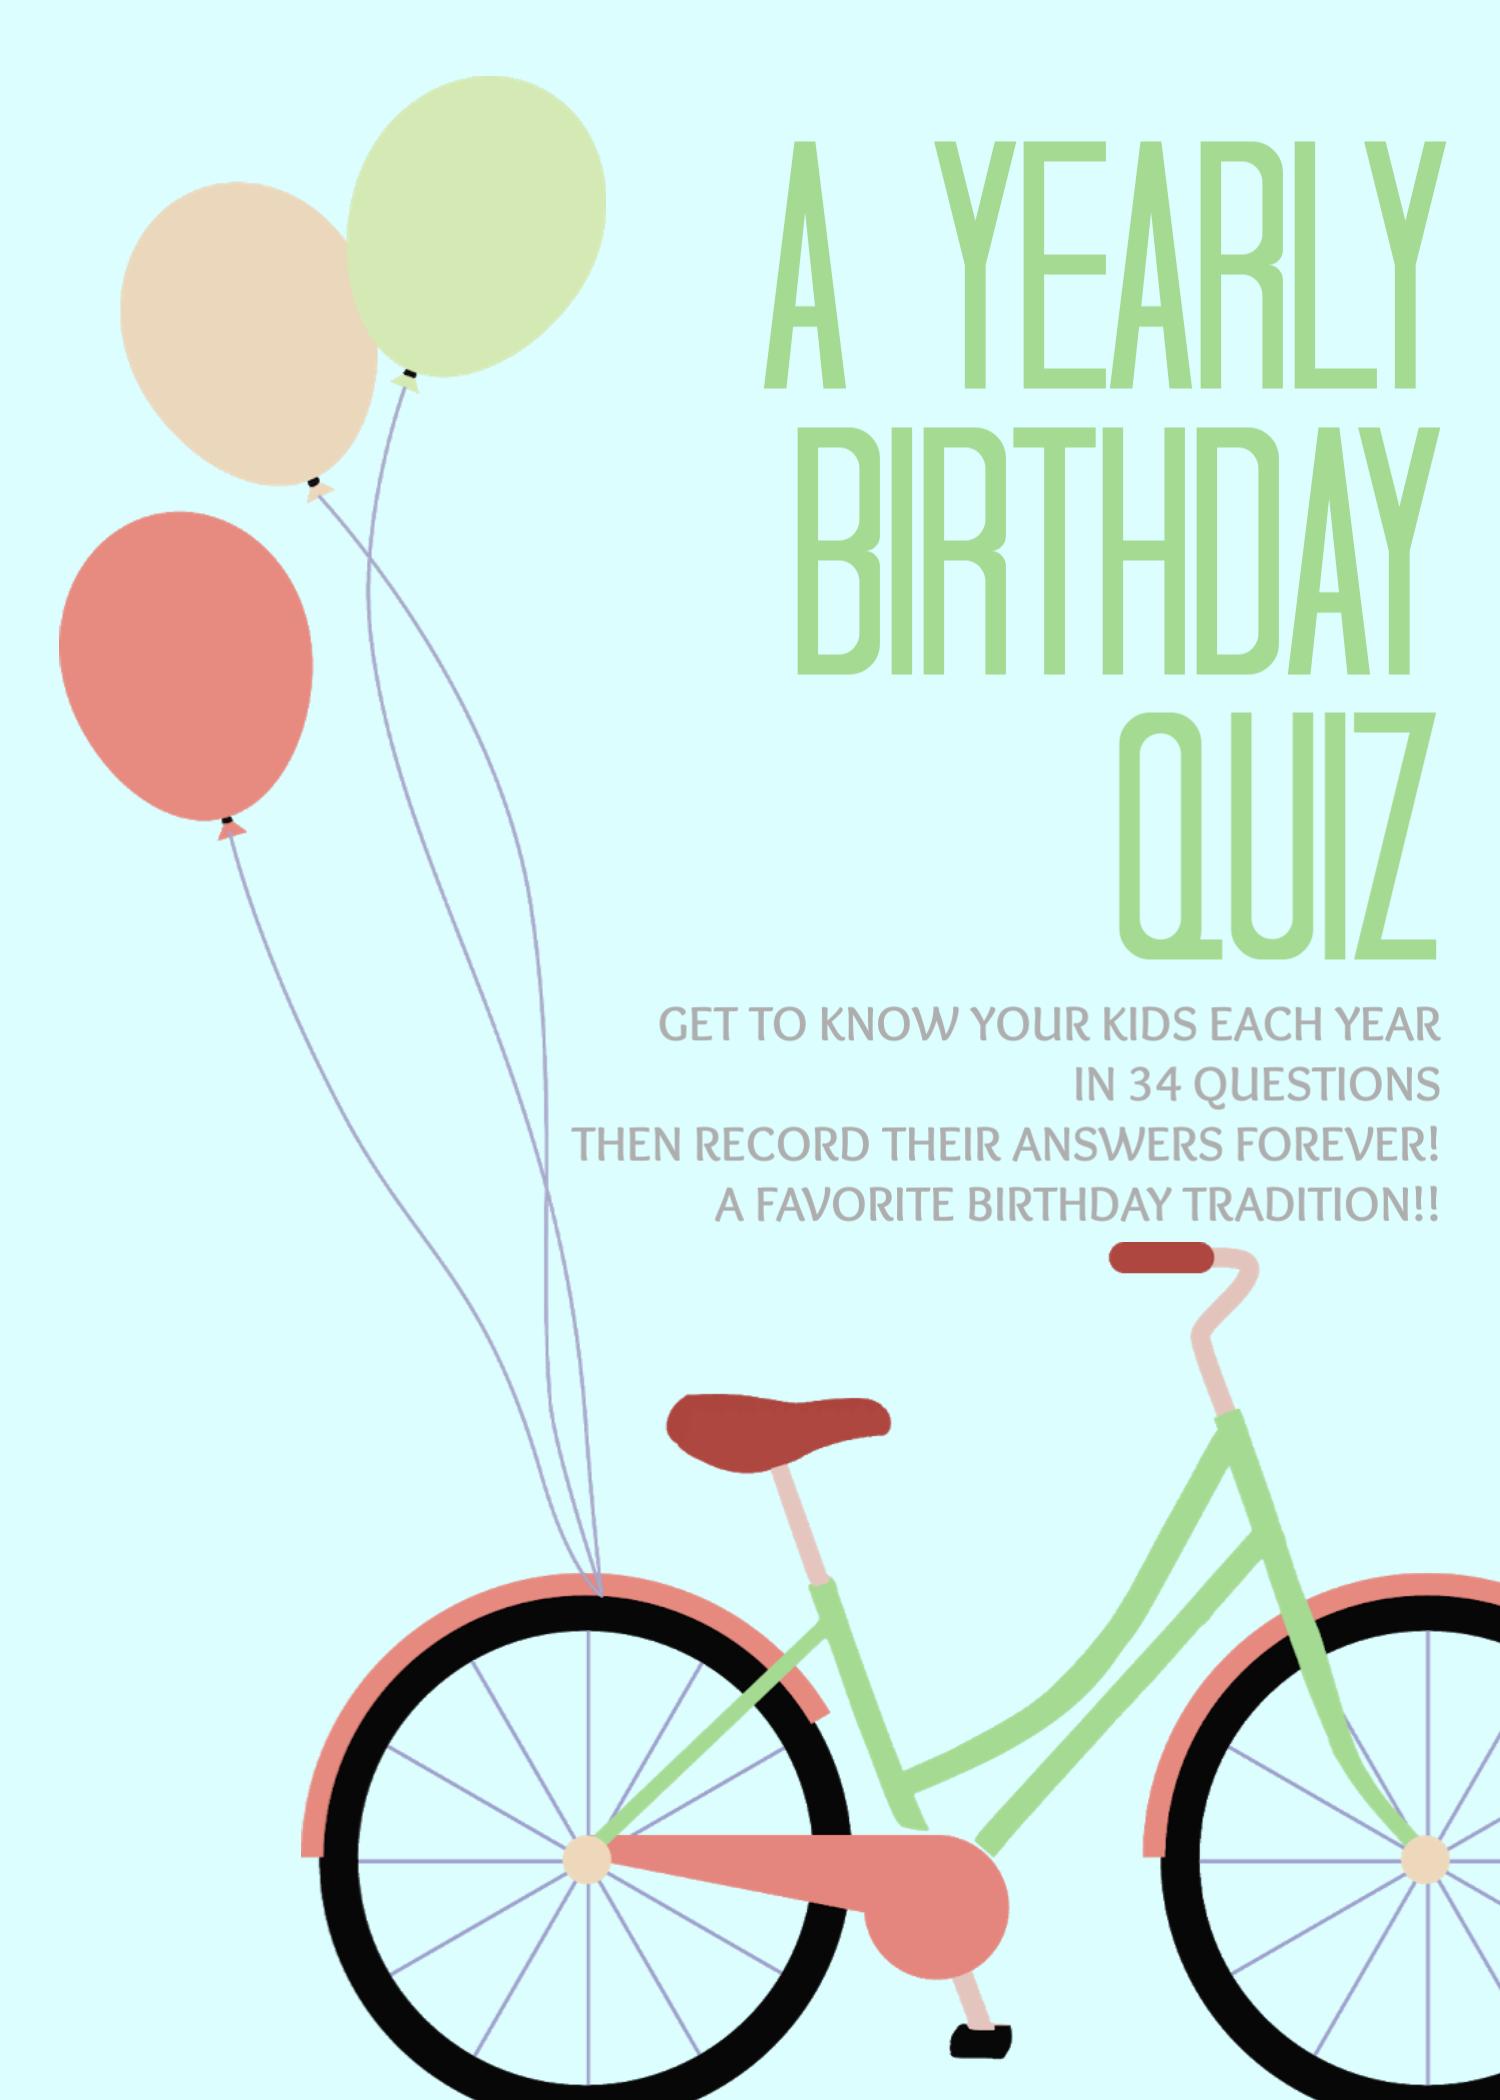 A Birthday Questionnaire Birthday quiz, Birthday traditions